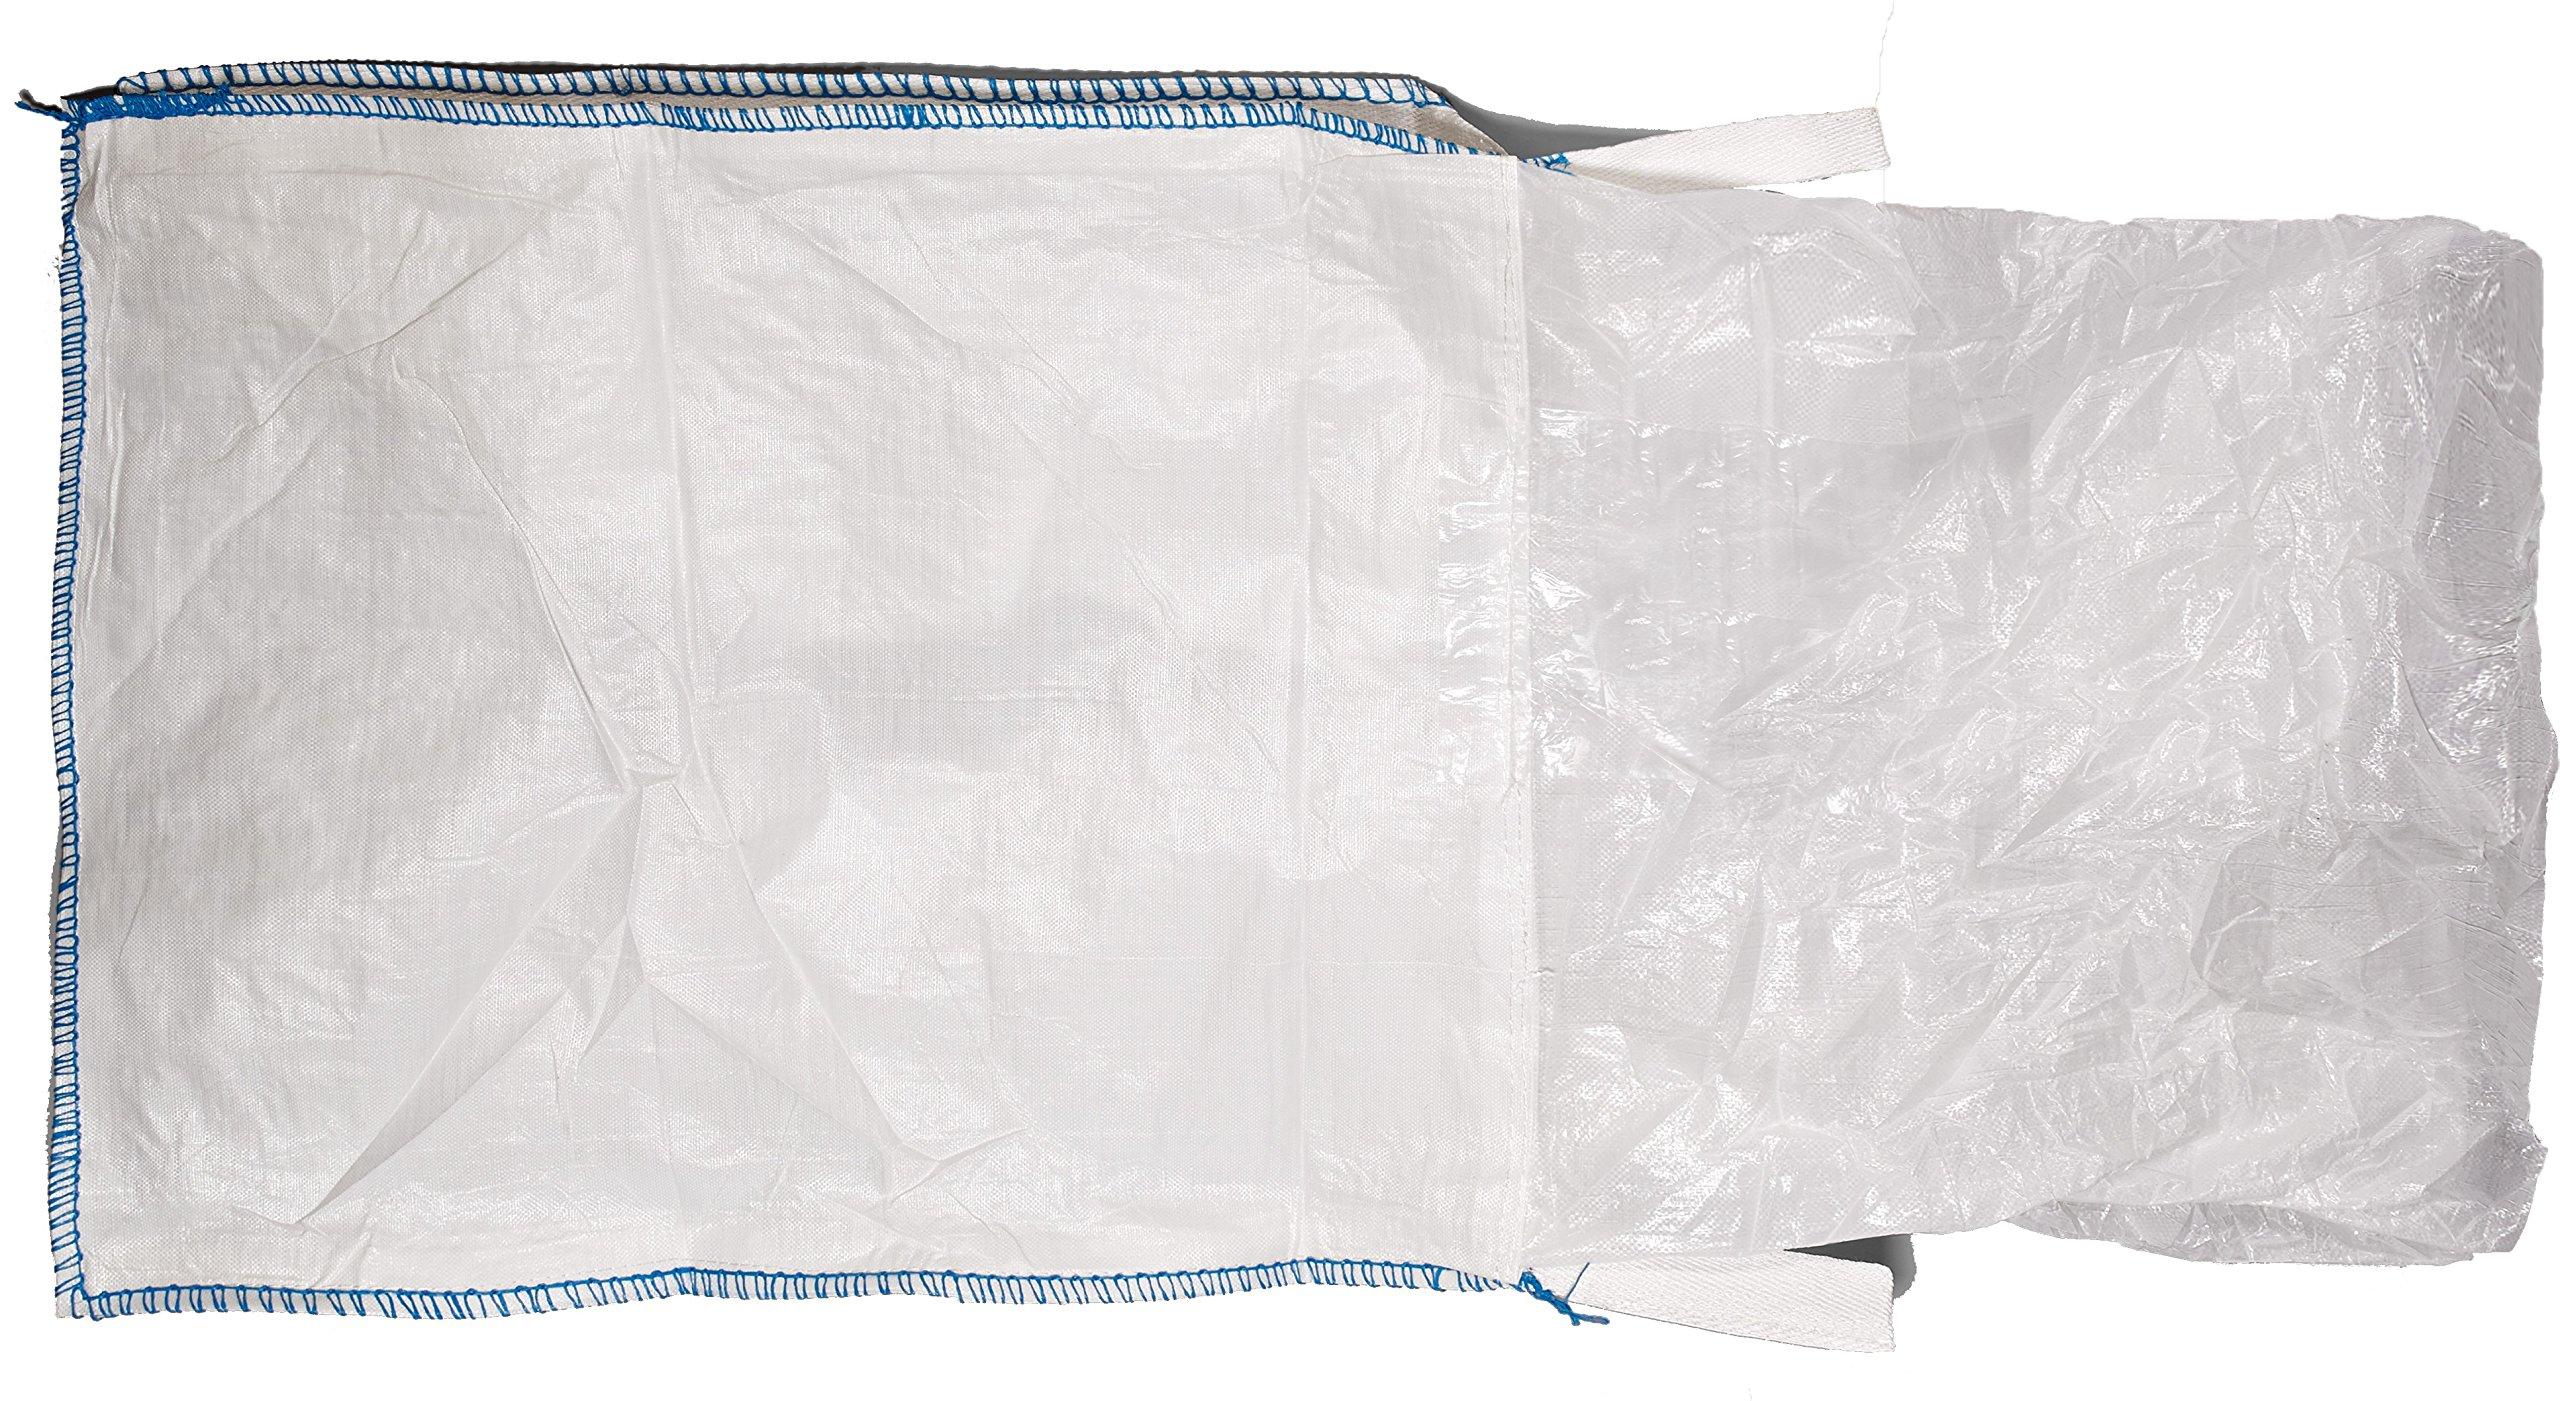 Mutual 14981 Polypropylene Bulk Bag, 3000 lbs Capacity, 3' Length x 3' Width x 3' Height by Mutual Industries